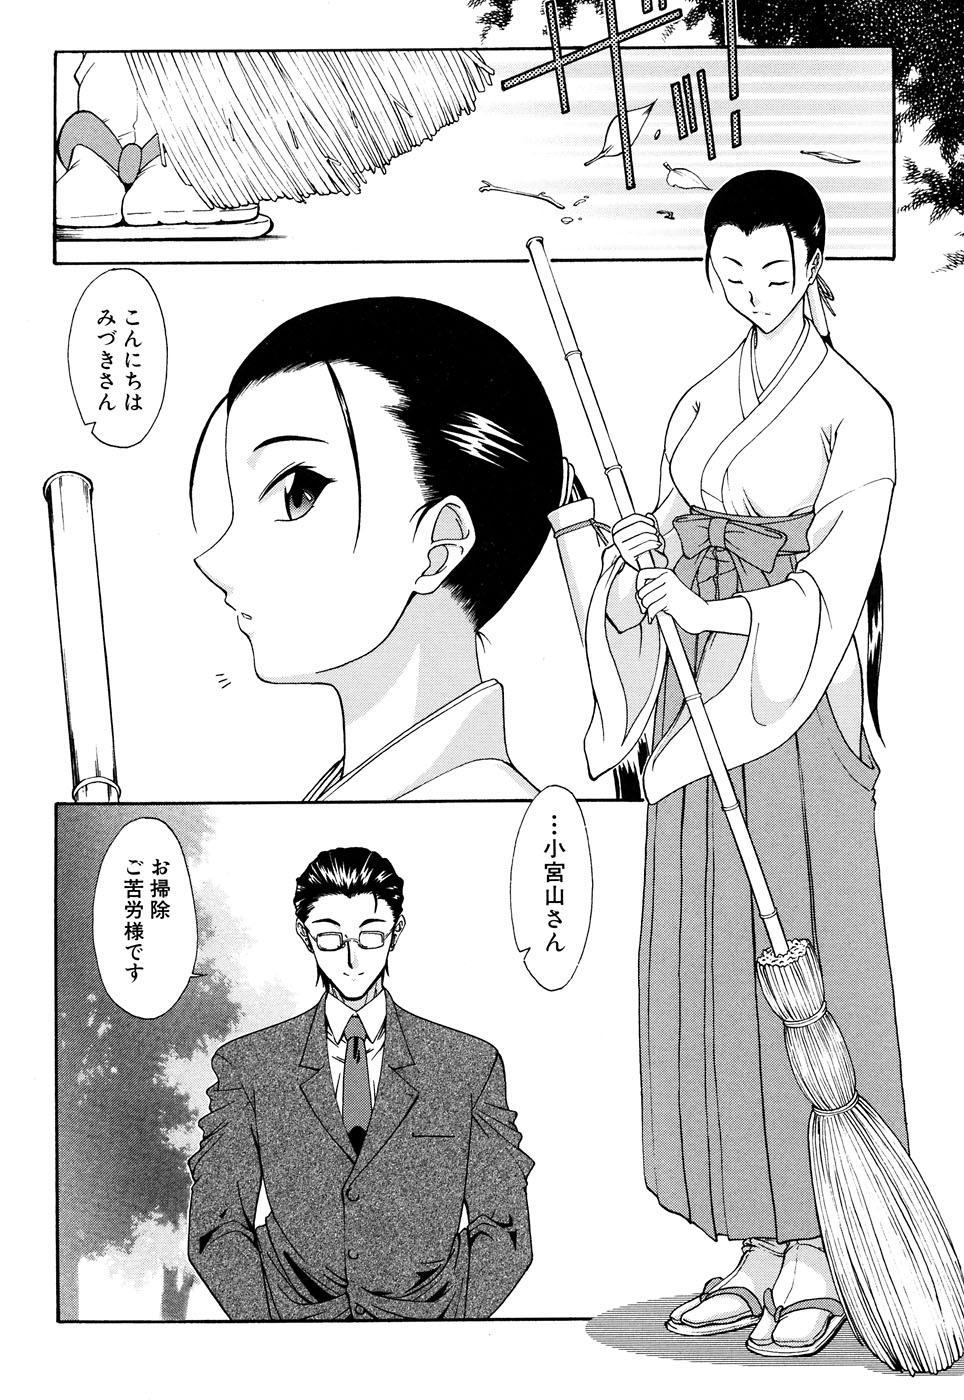 Fechikko VS Series ROUND.2 Miko San VS Maid San 10